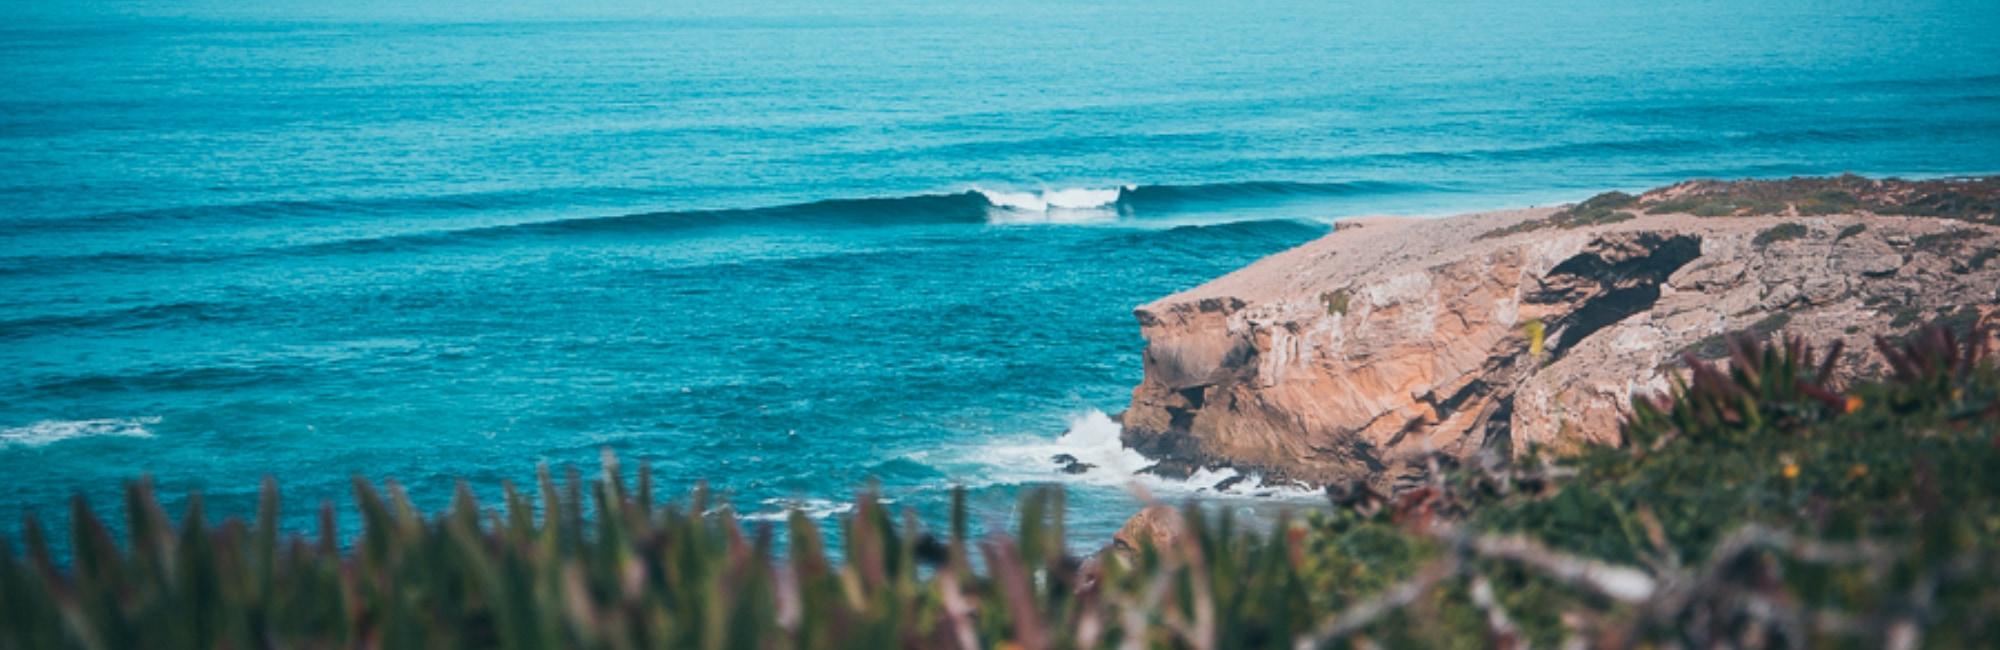 An empty perfect wave in Monte Clerigo beach in the Algarve Portugal